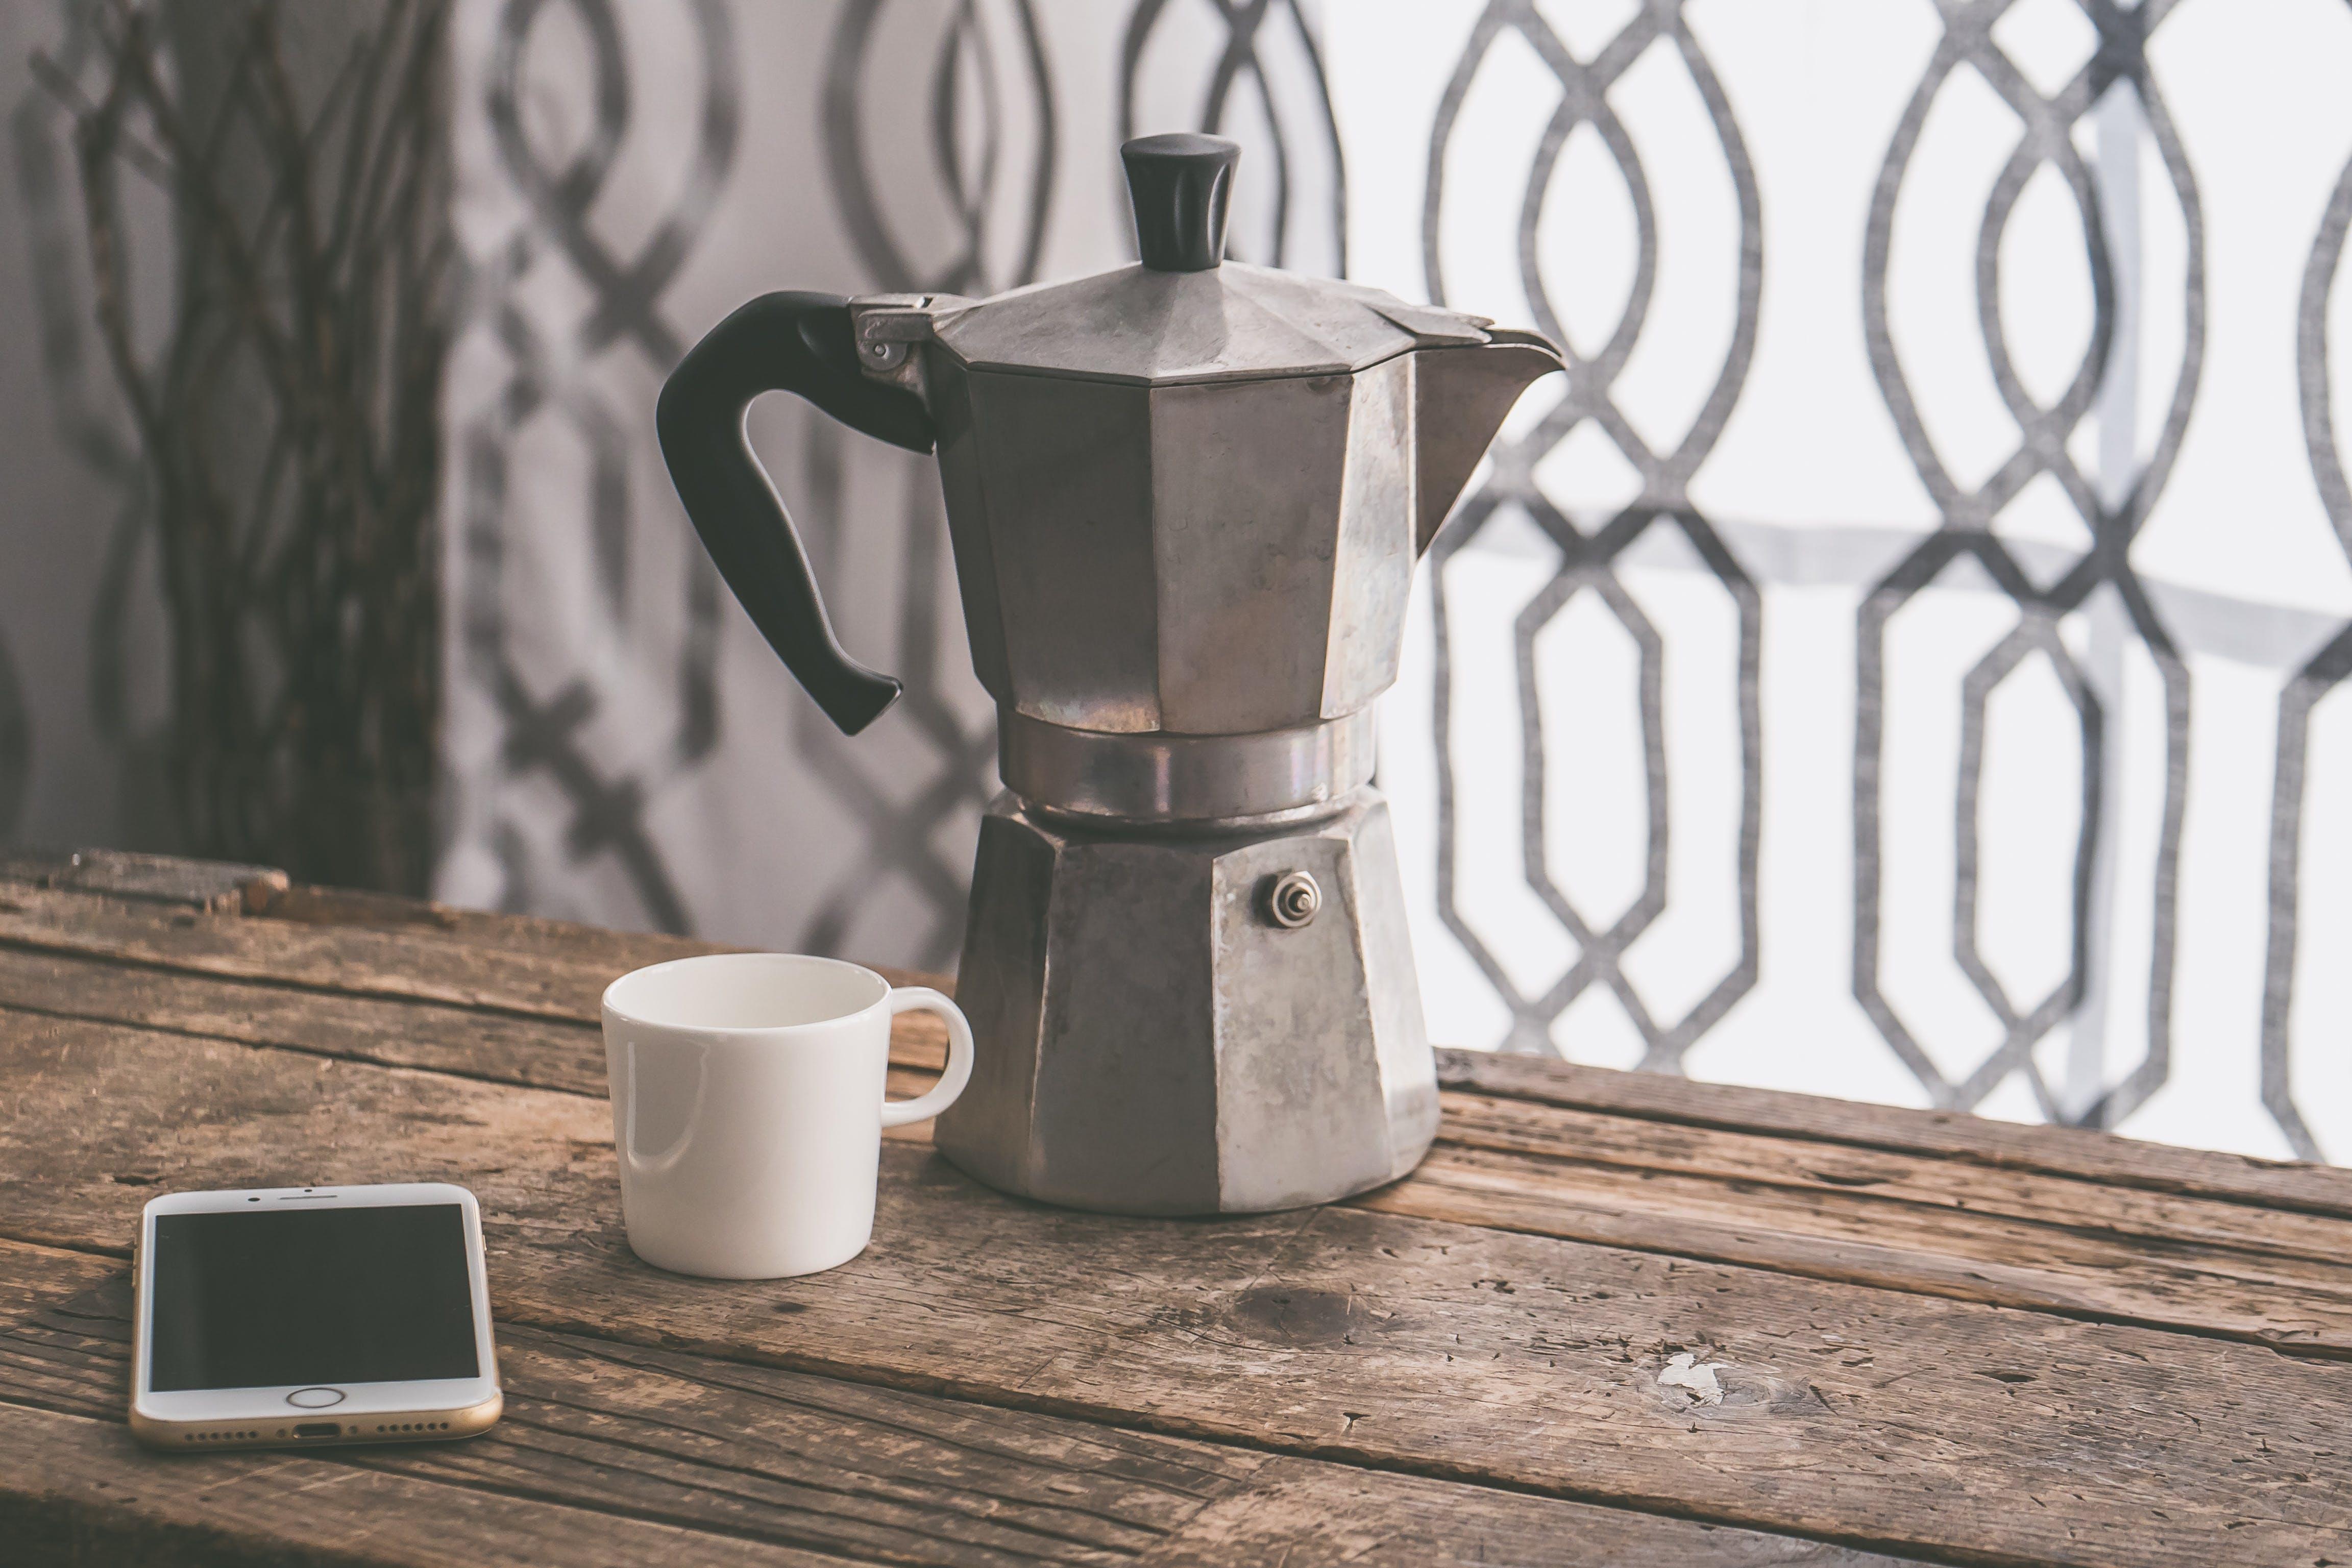 caffeine, coffee, coffee maker